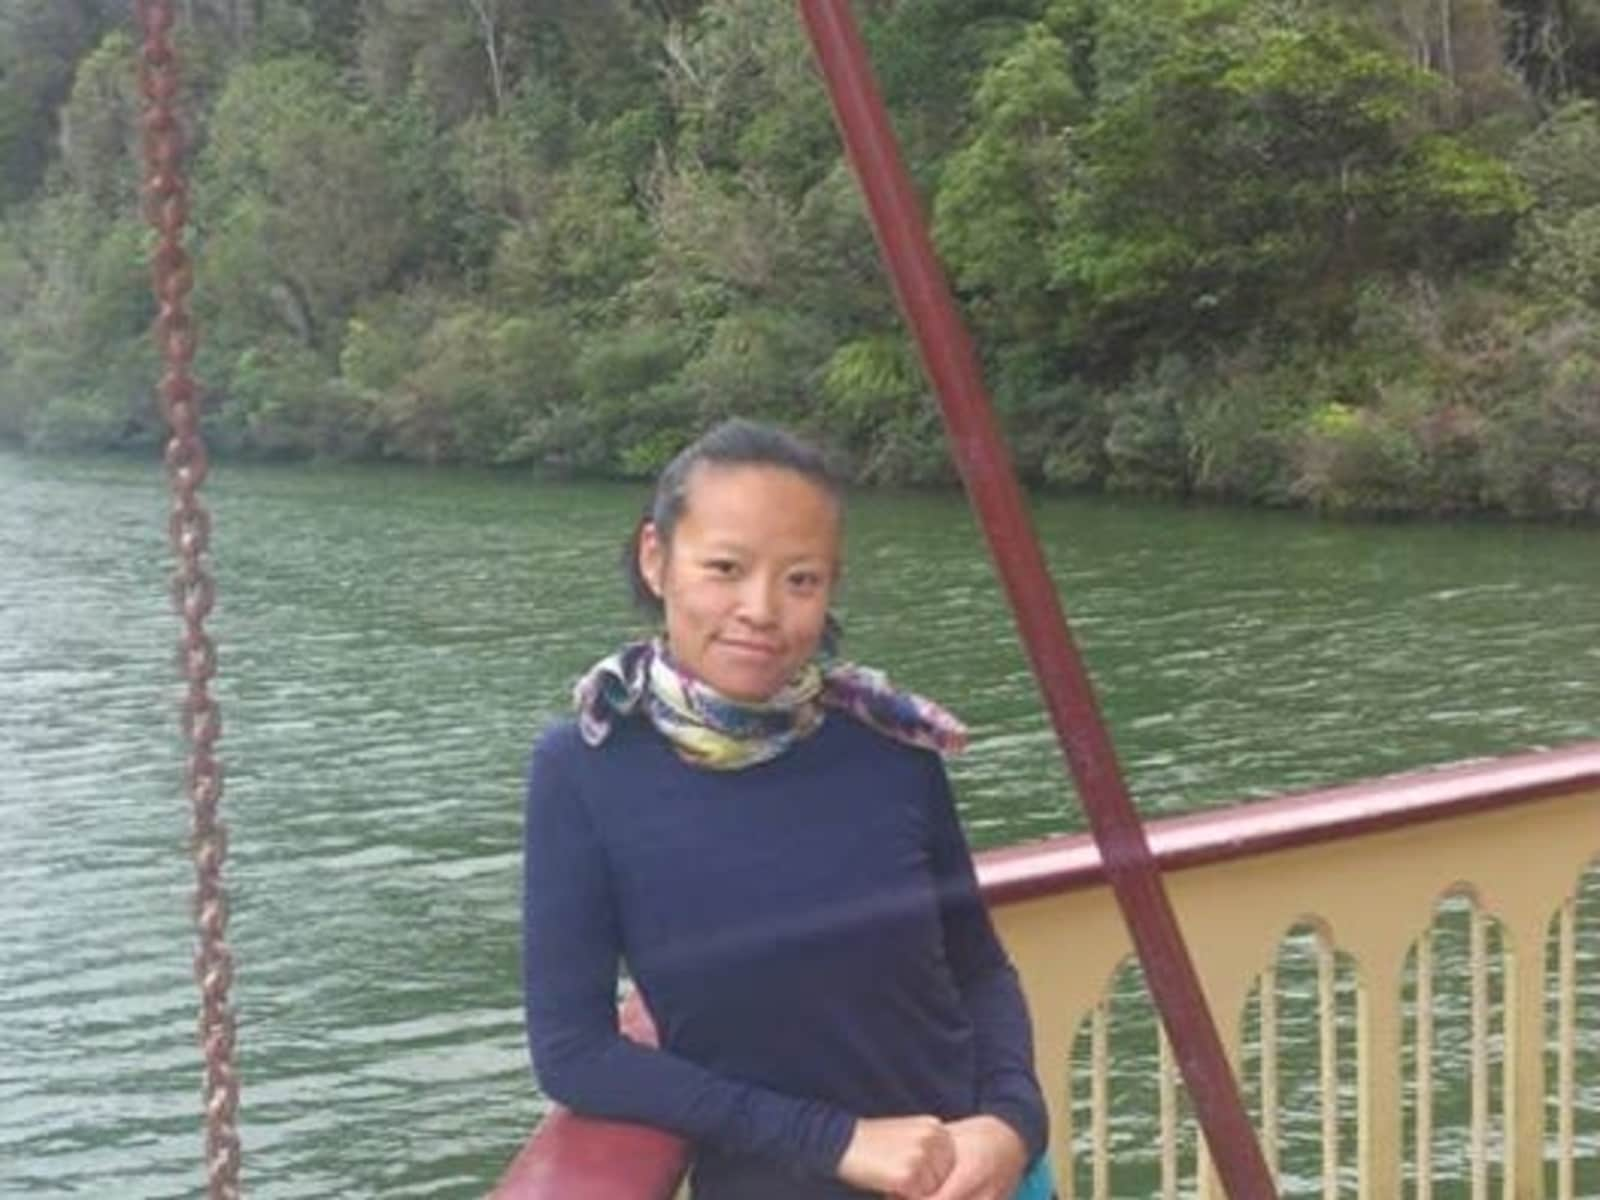 Jennifer from Canberra, Australian Capital Territory, Australia